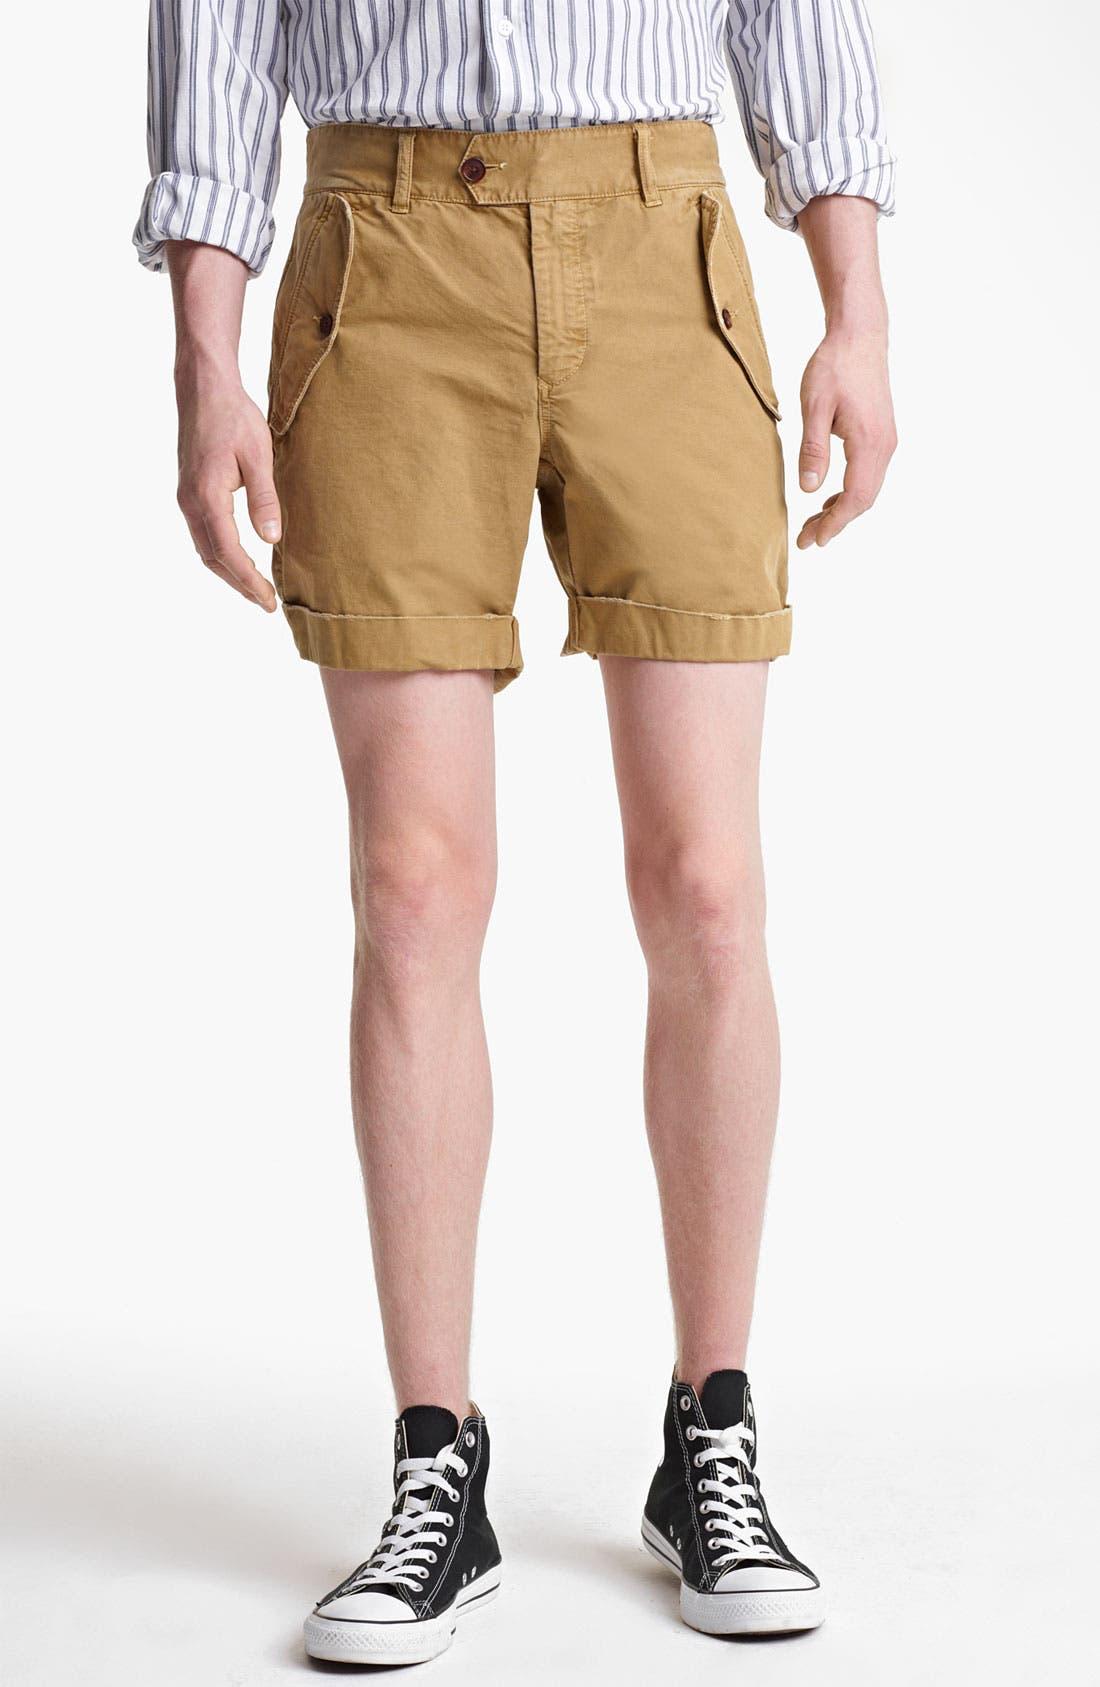 Main Image - Gant by Michael Bastian Military Shorts